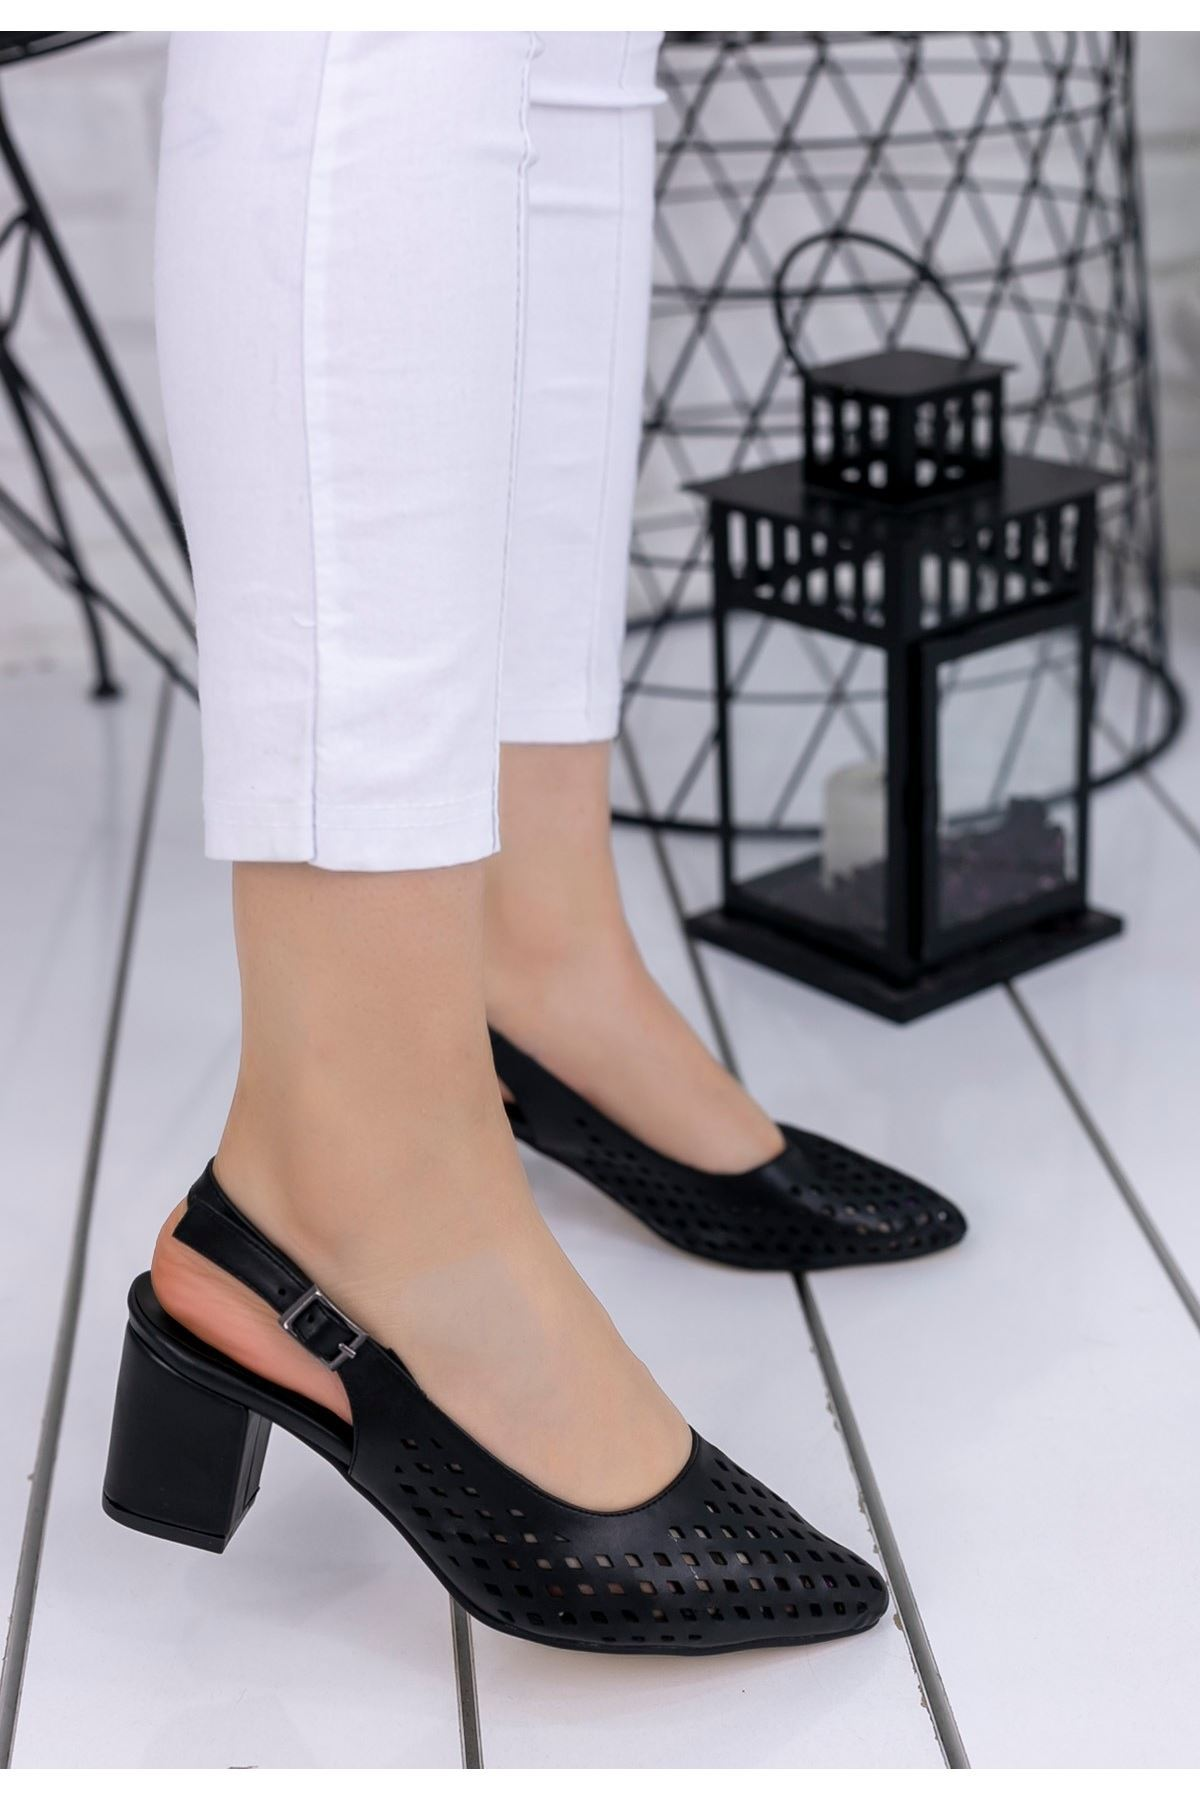 Zendi Siyah Cilt Fileli Topuklu Ayakkabı